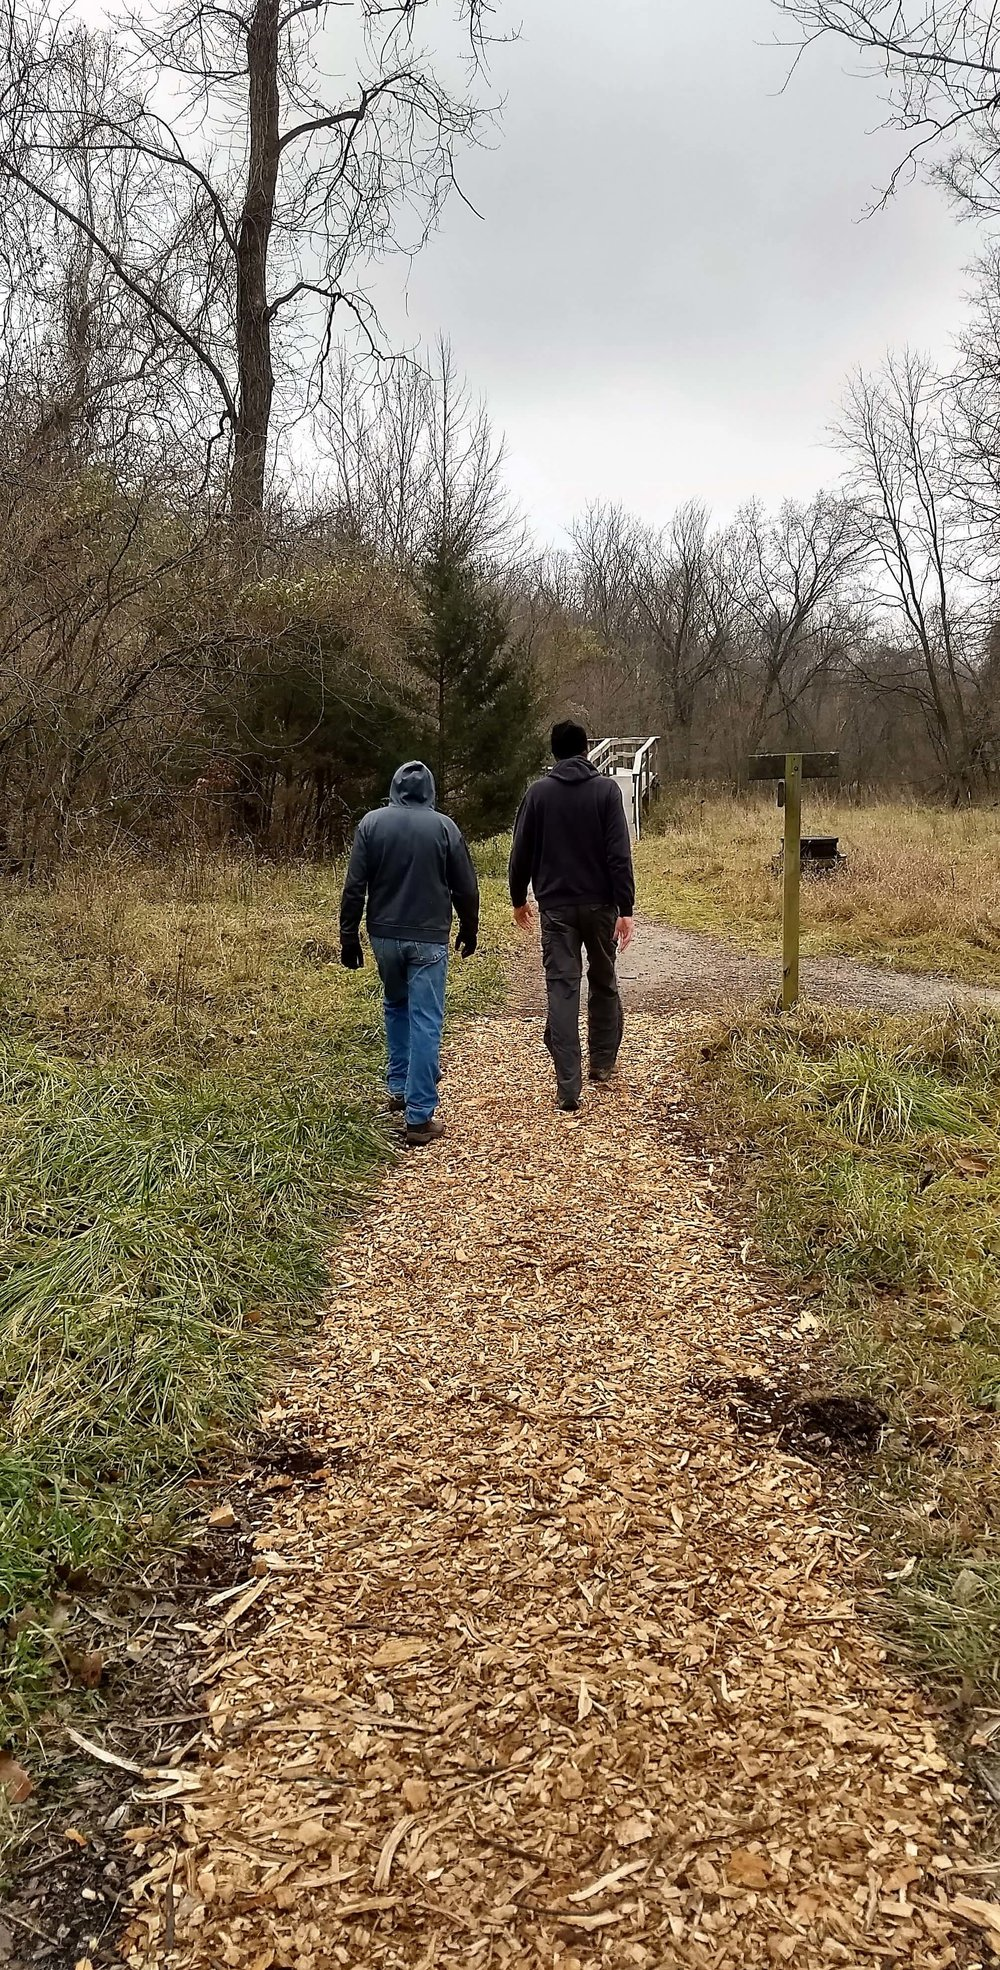 Bill & Steve 12.2017 Walking path to bridge (1).jpg